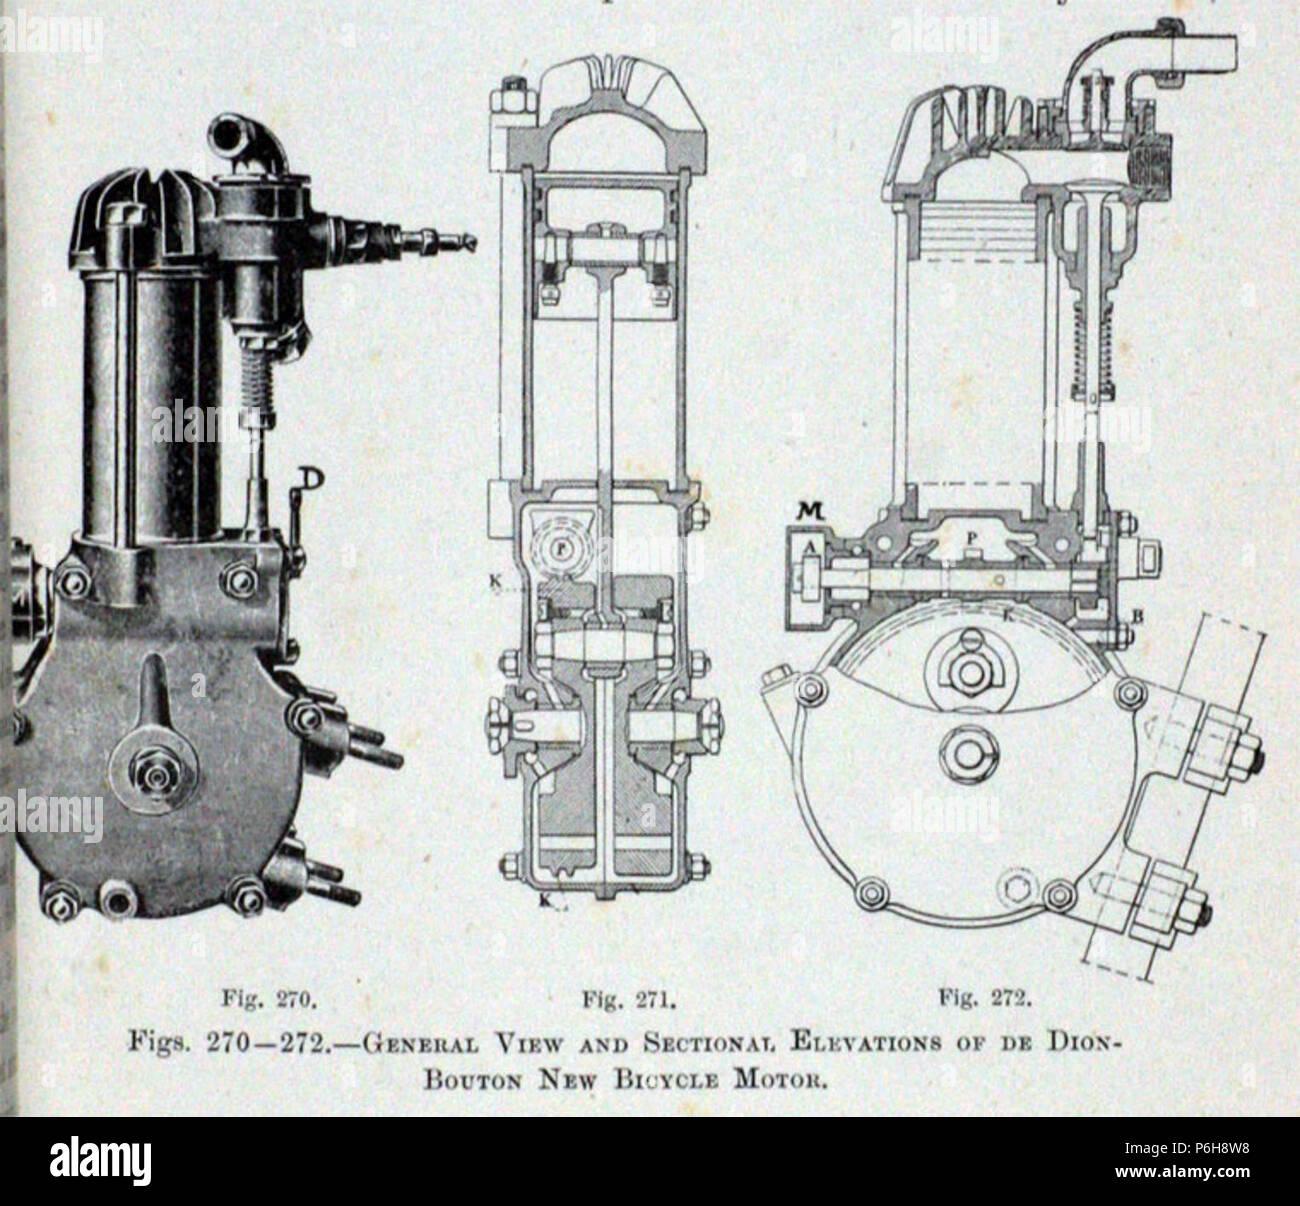 1906 De Dion Bouton Bicycle Engine Stock Photo 210592516 Alamy Bike Diagram